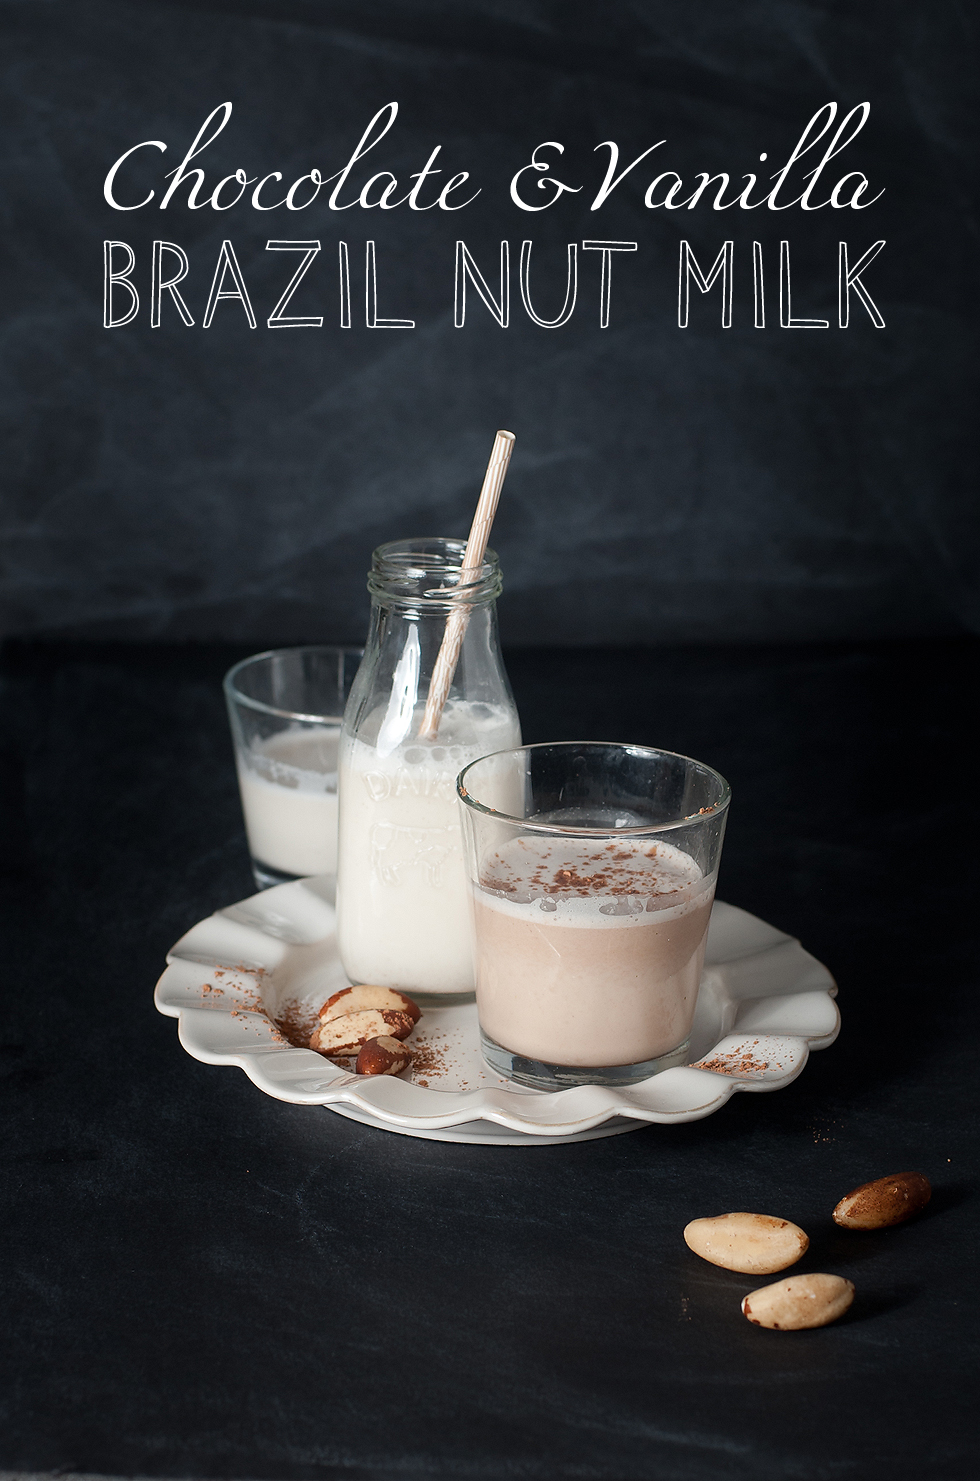 brazil nut milk_title